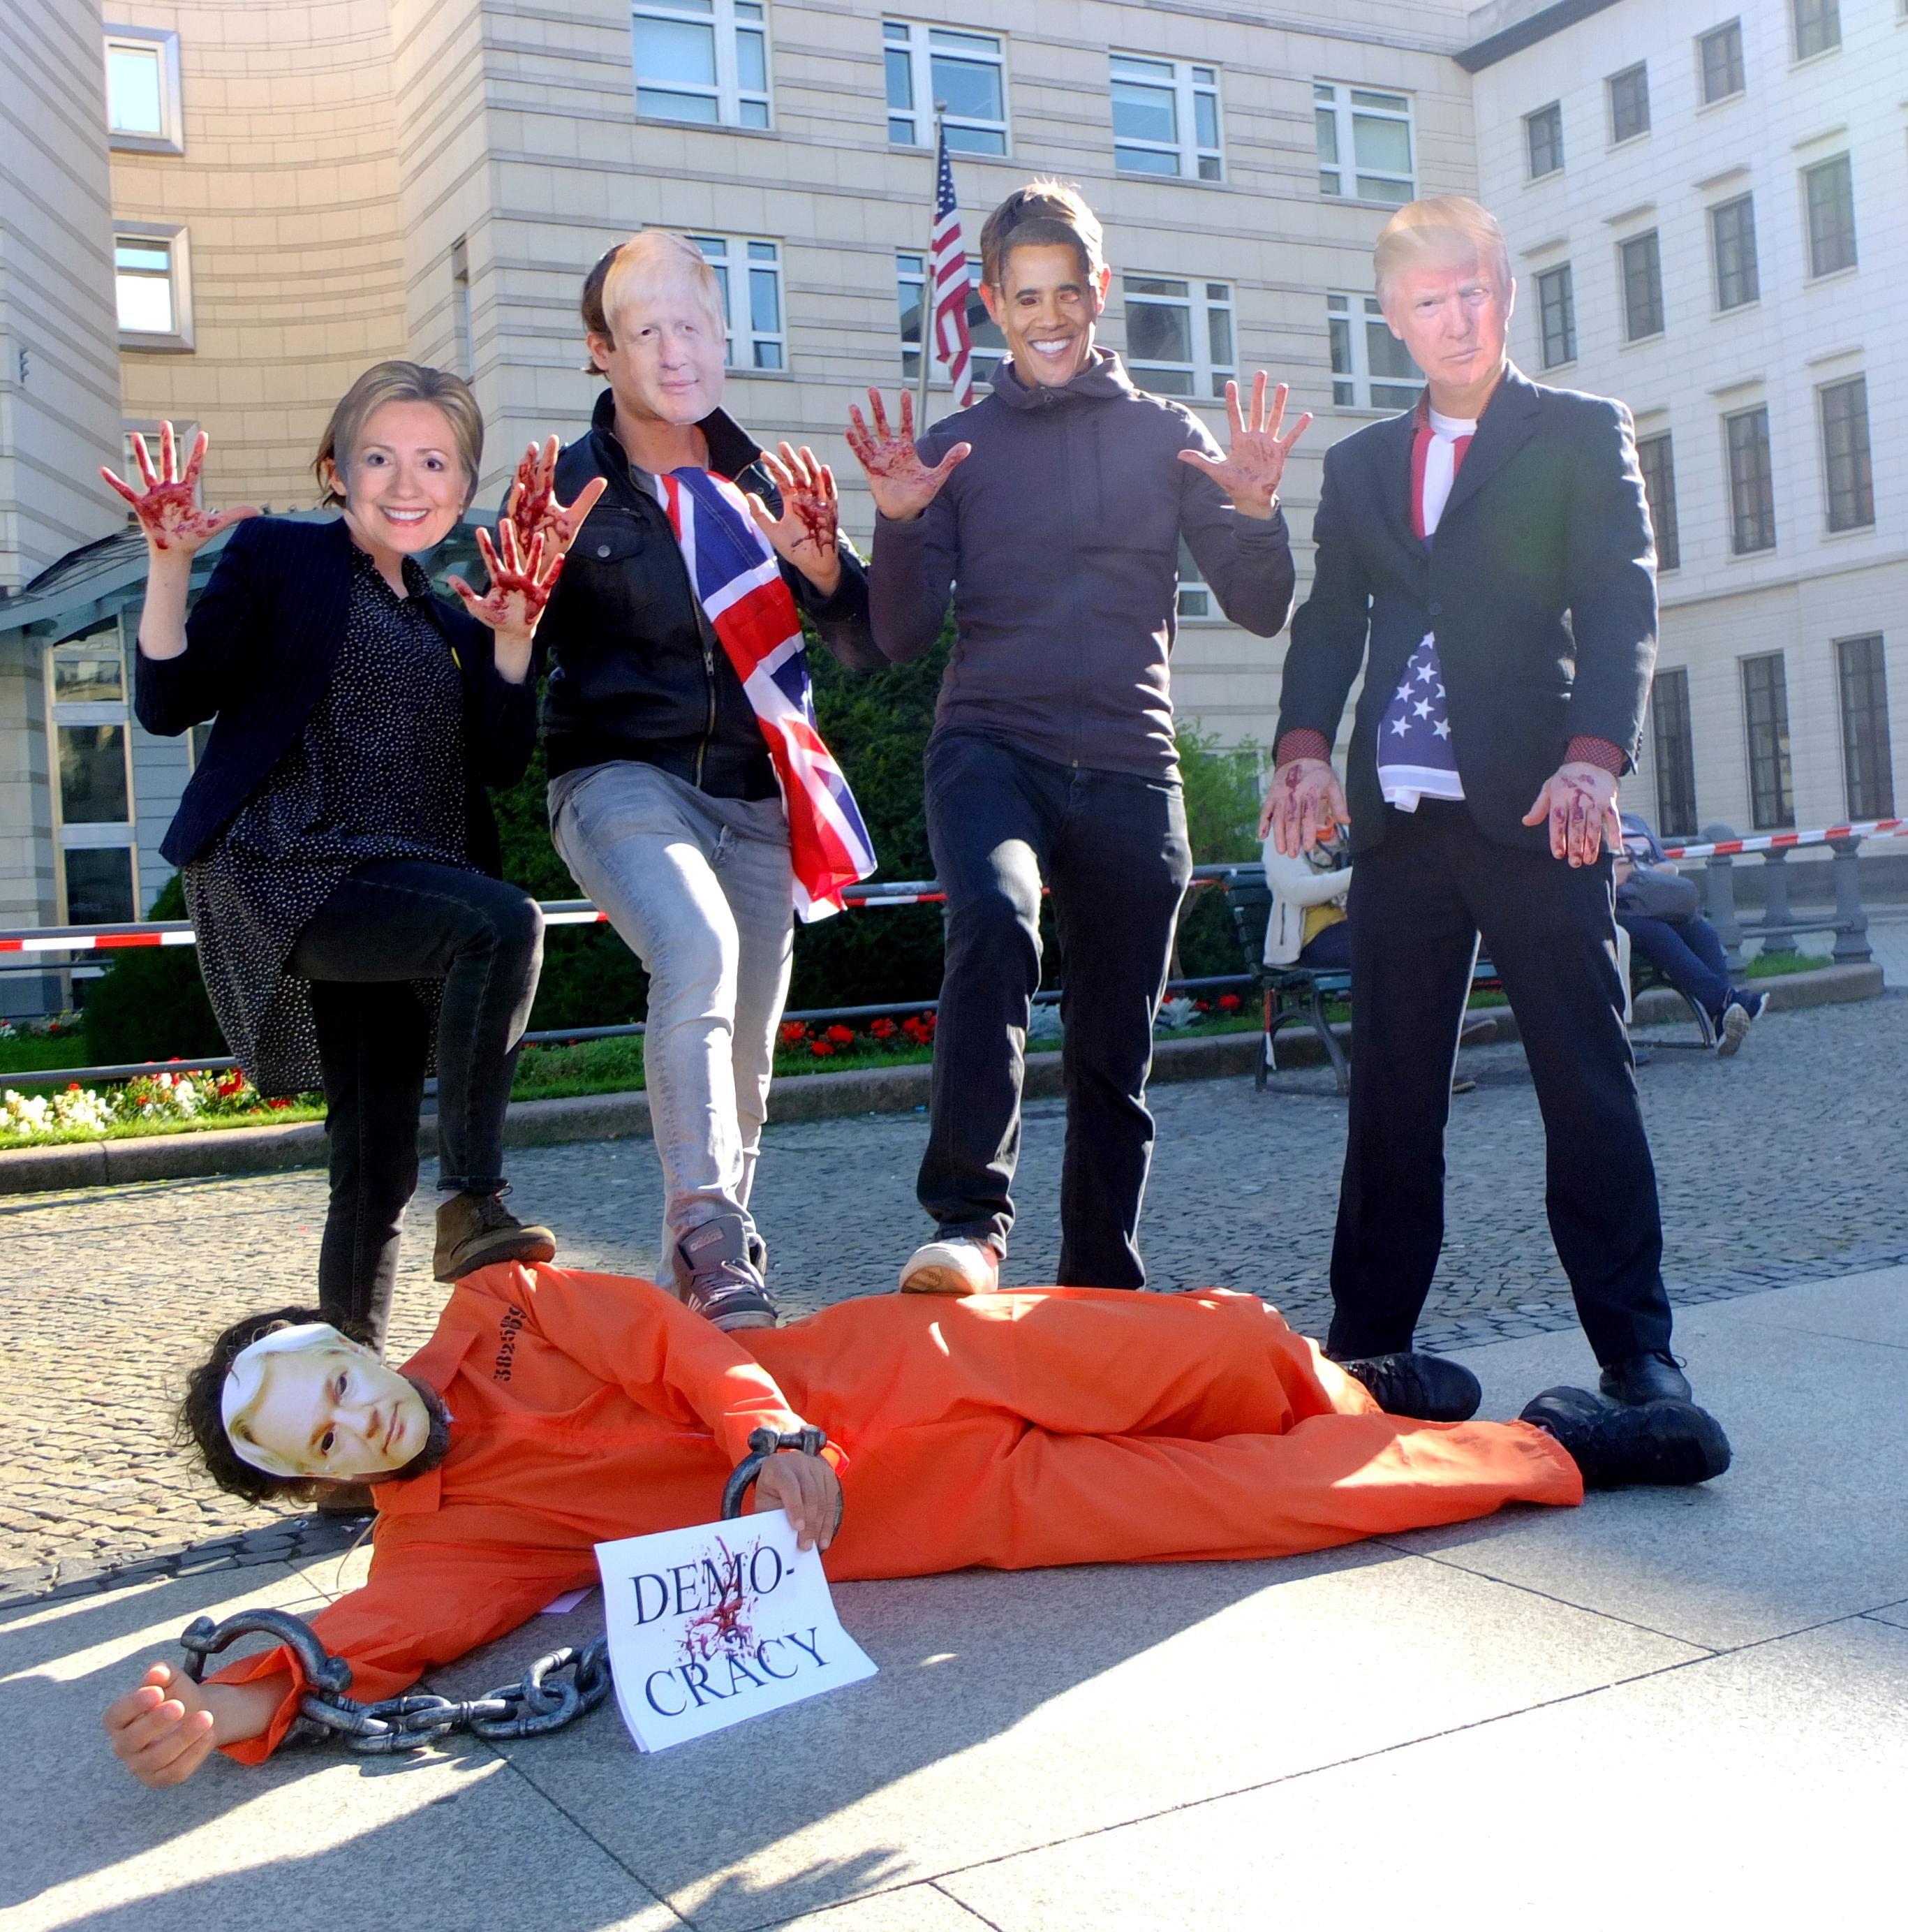 war_criminals_w_blood_on_hands-trampling_democracy.jpg